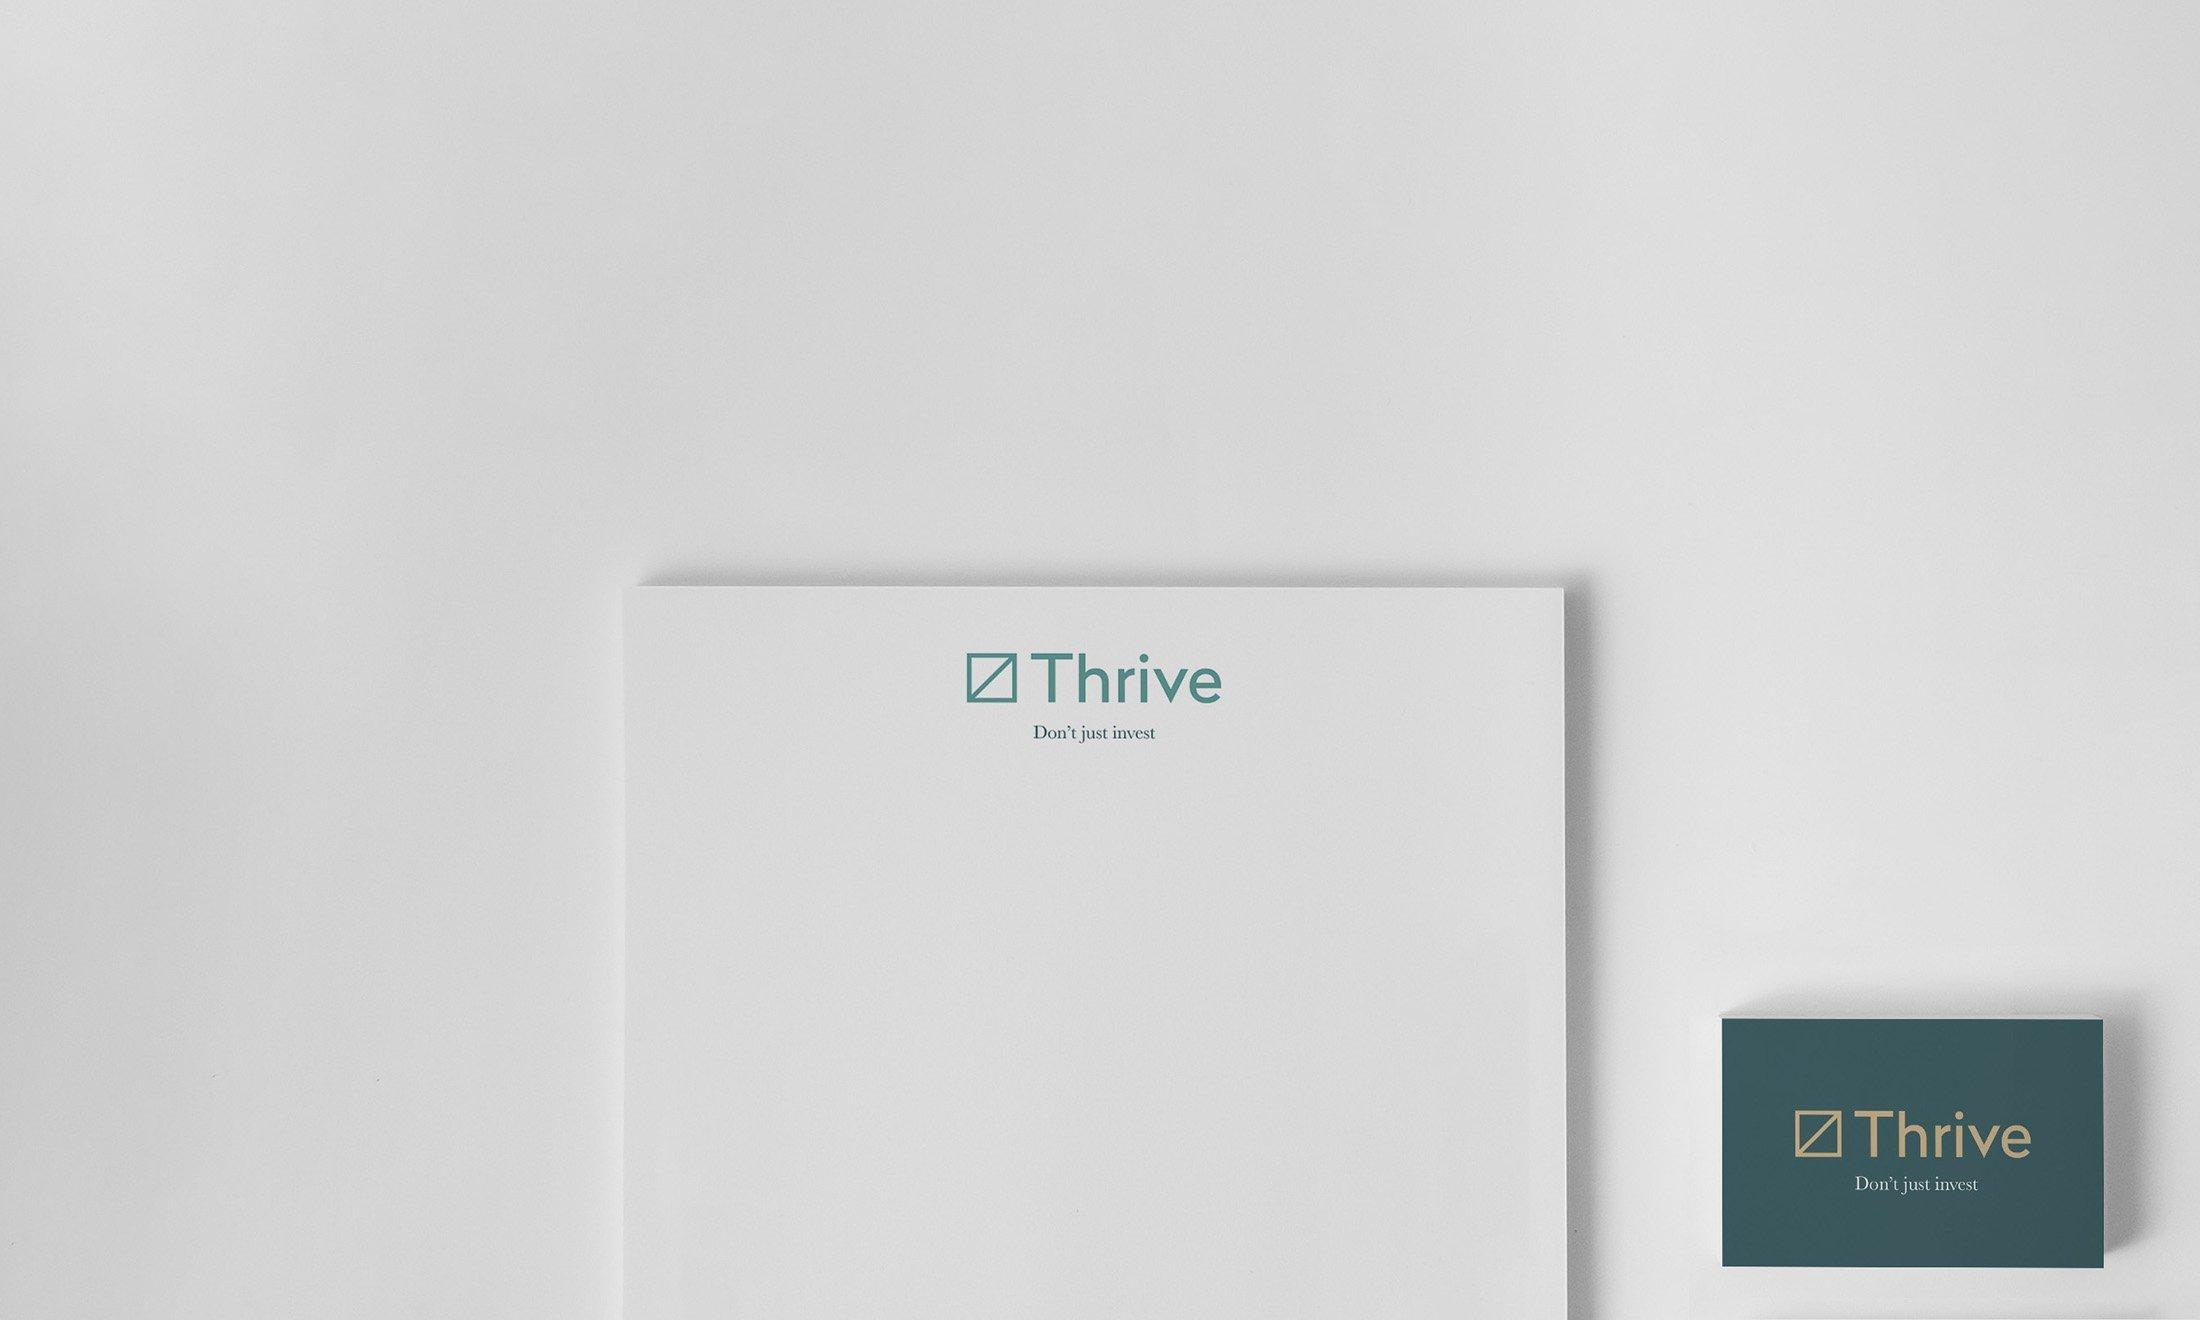 Thrive Brand Identity